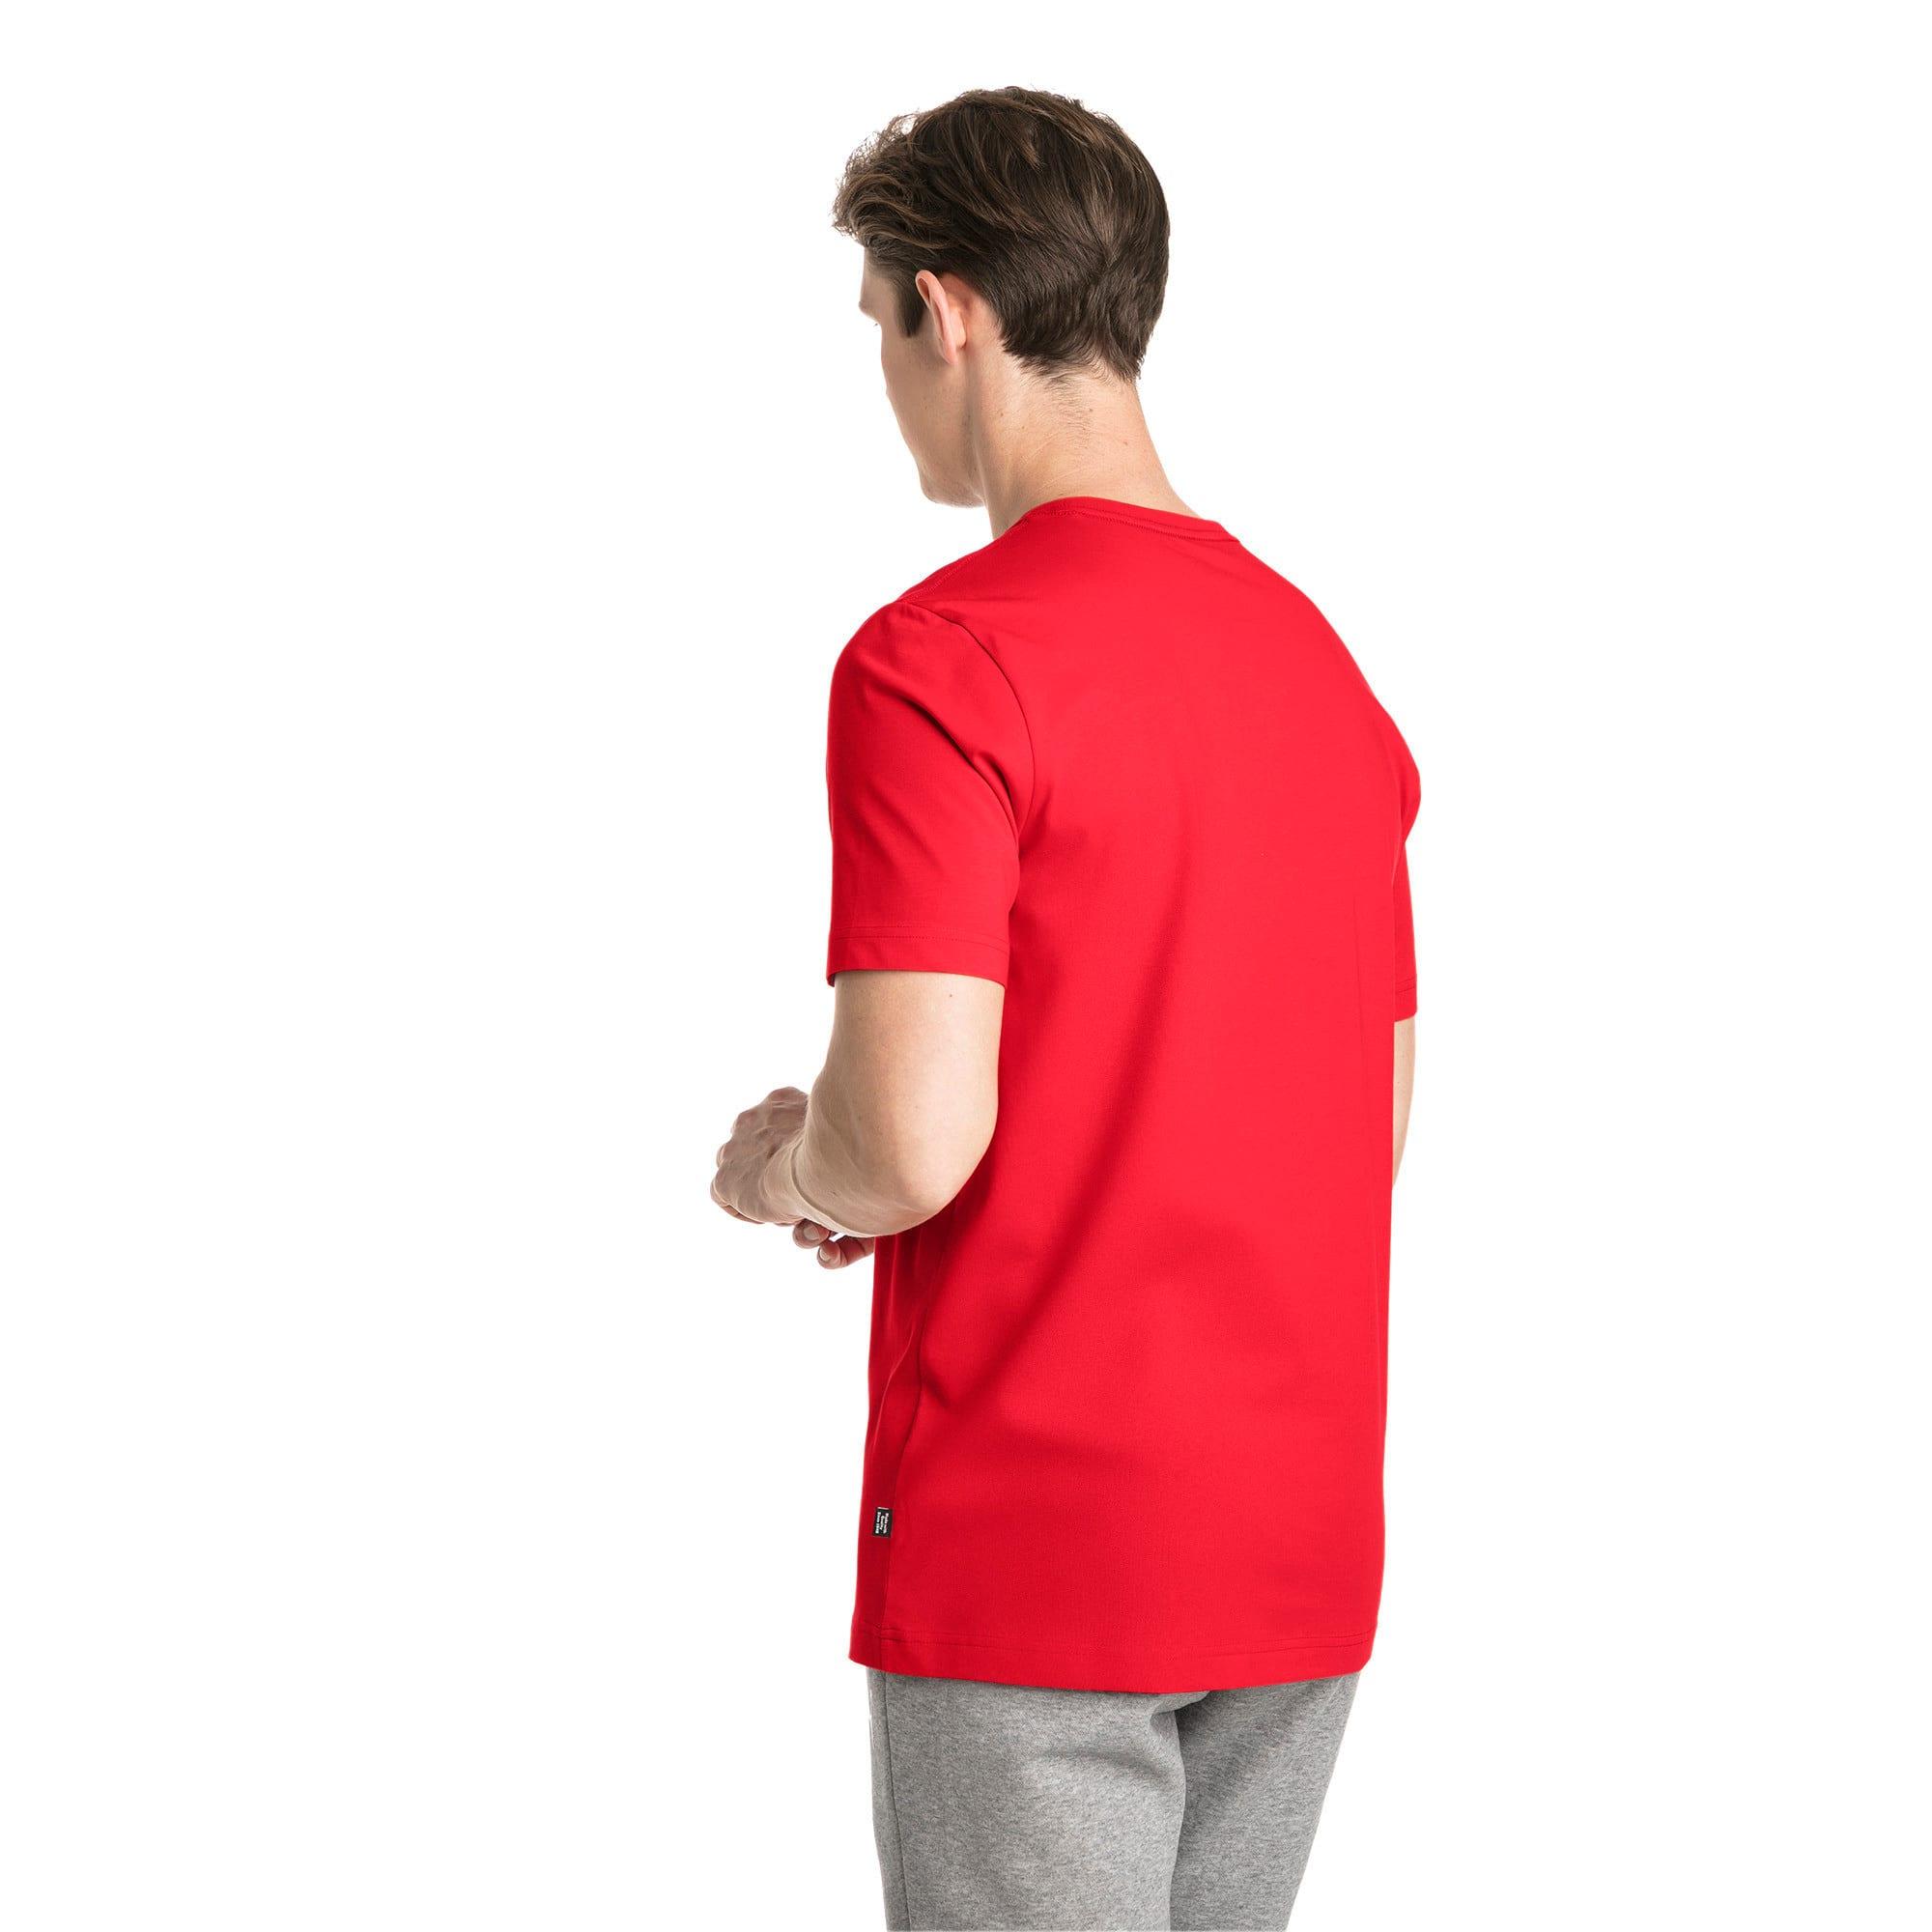 Thumbnail 2 of T-shirt a maniche corte Essentials uomo, Puma Red, medium